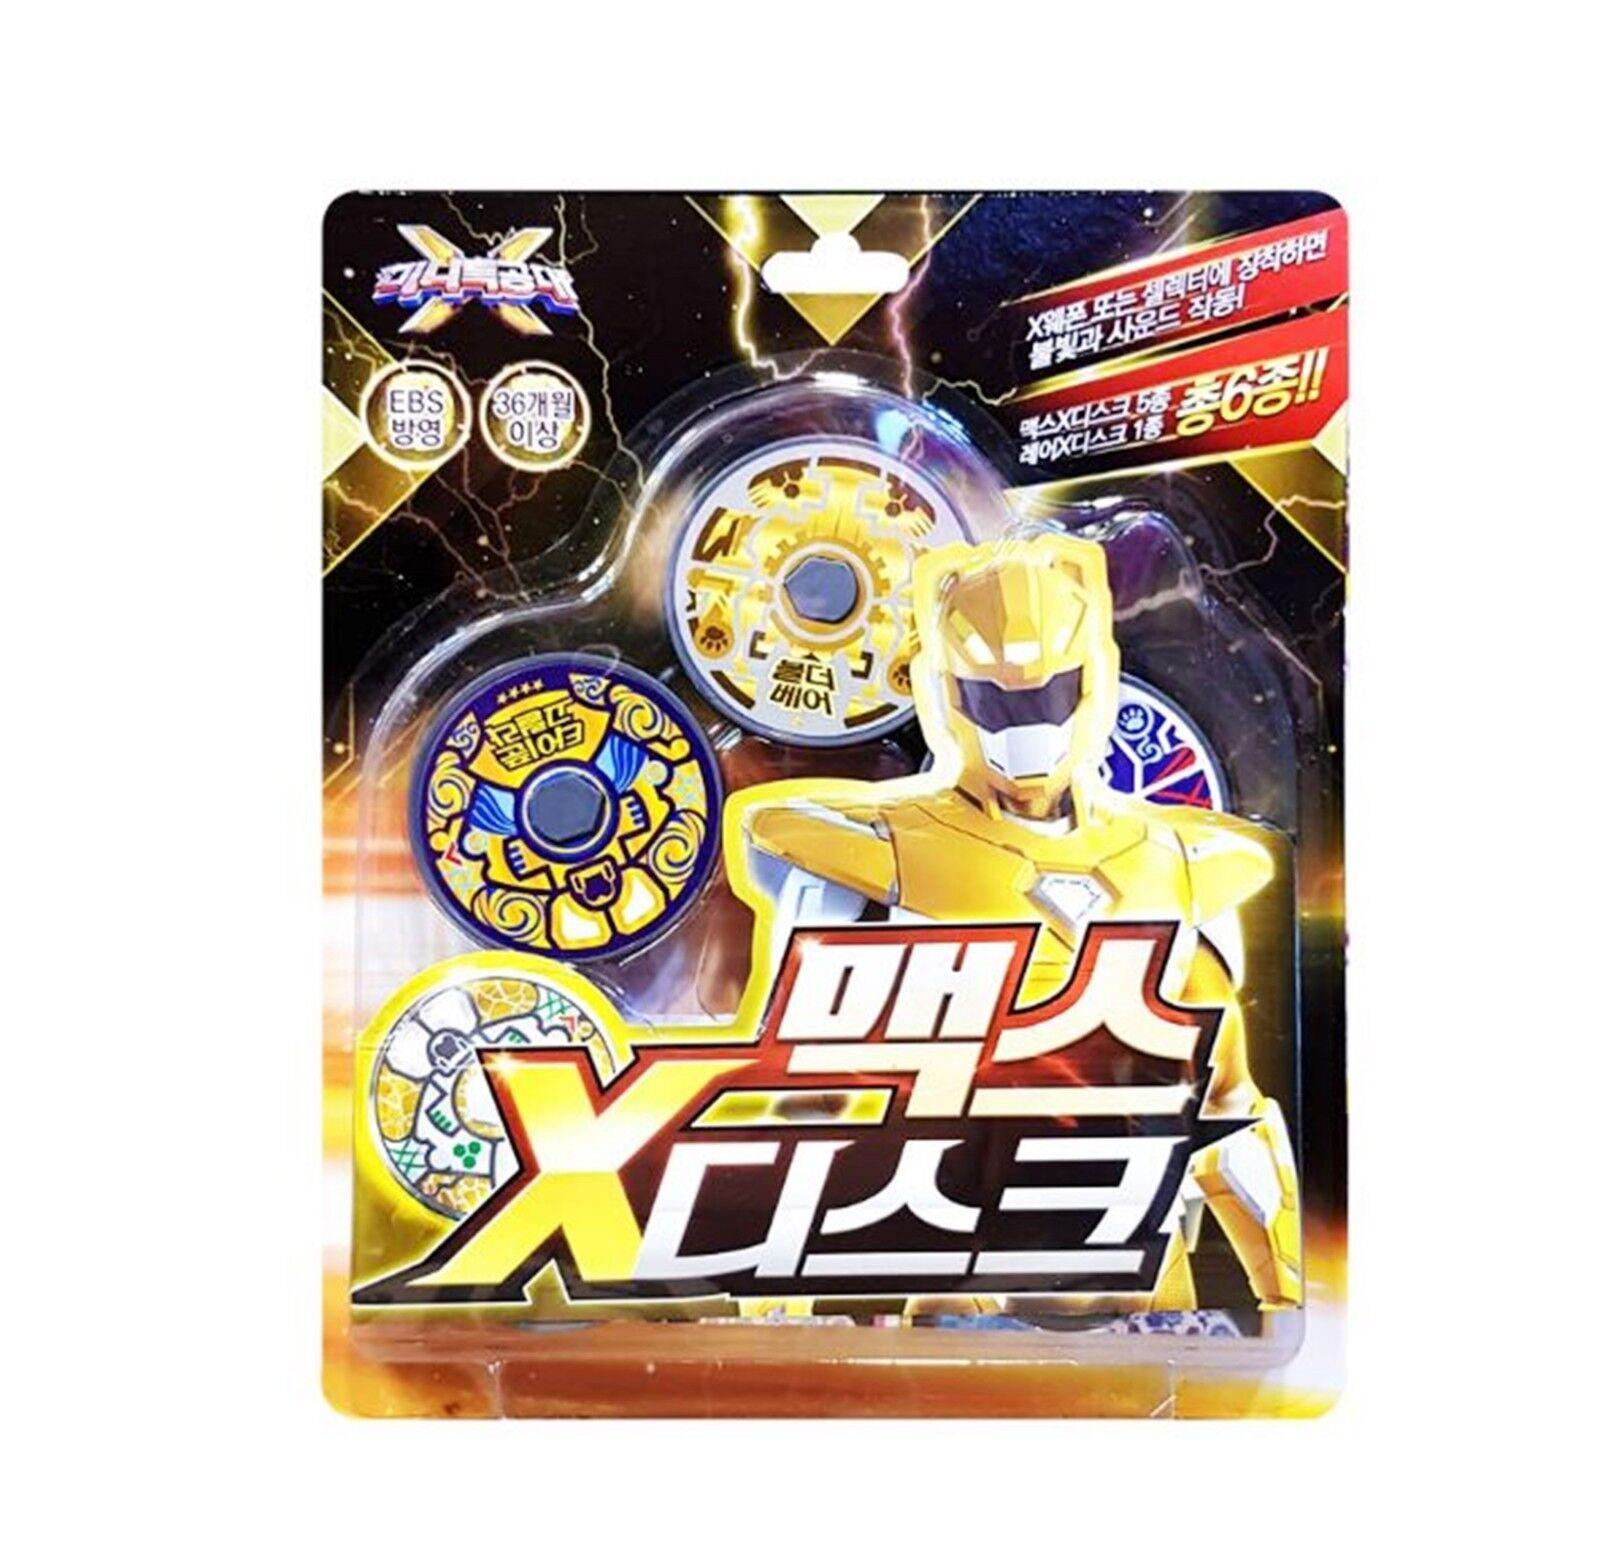 Miniforce Miniforce Miniforce Mini Force X Ranger  Weapon MAX + 6 Disk Gun Sword Transweapon Toy Set 439f8b